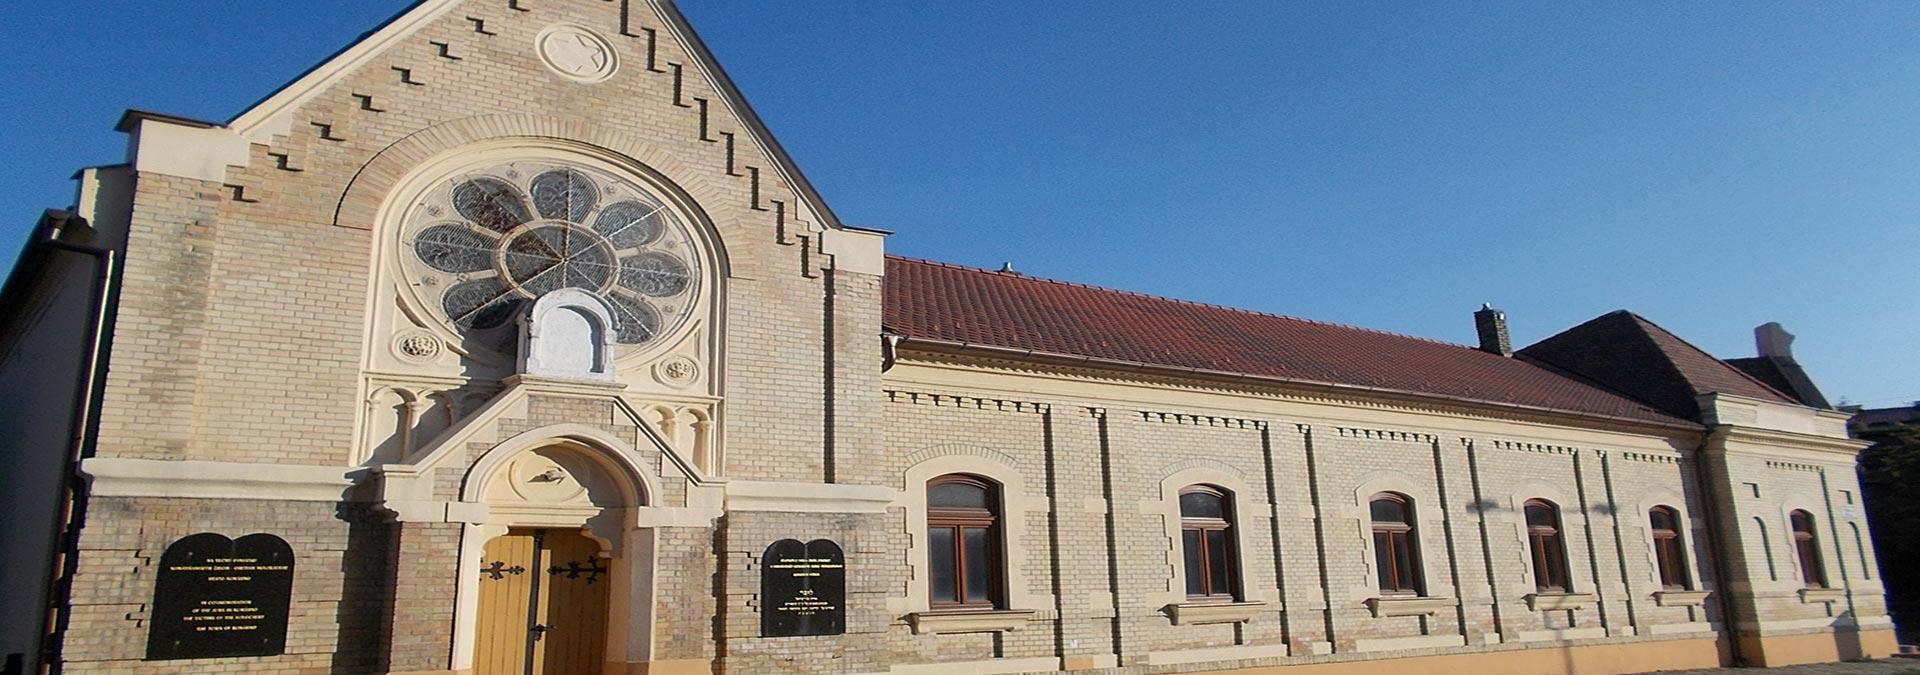 Jewish Heritage Tour in Slovakia and Poland, Slovakia Travel, Location